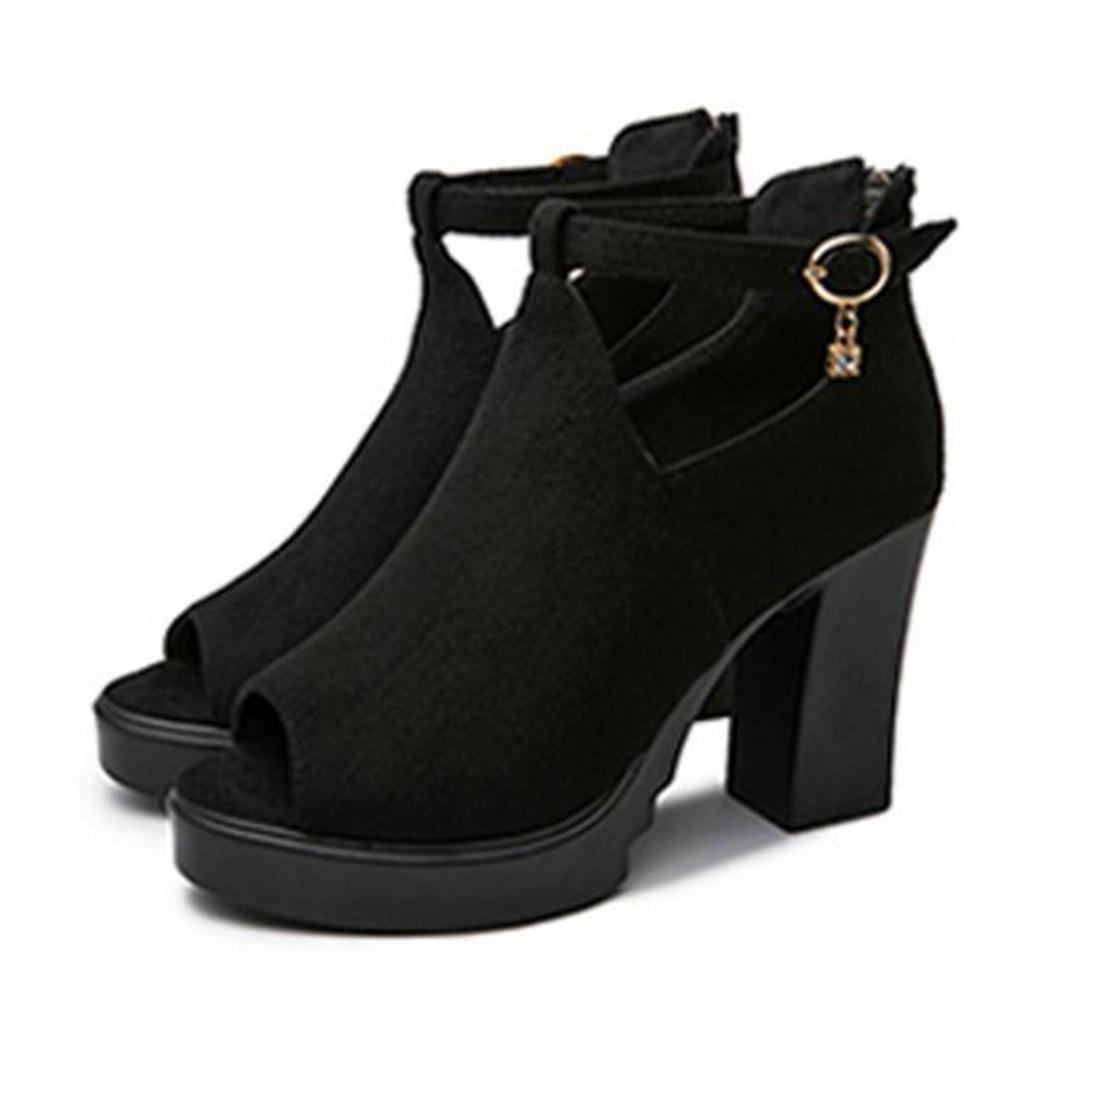 European sandals shoes - Hot Sale European Women Summer Shoes Buckle Strap High Heels Sandals Platform Casual Shoes For Party